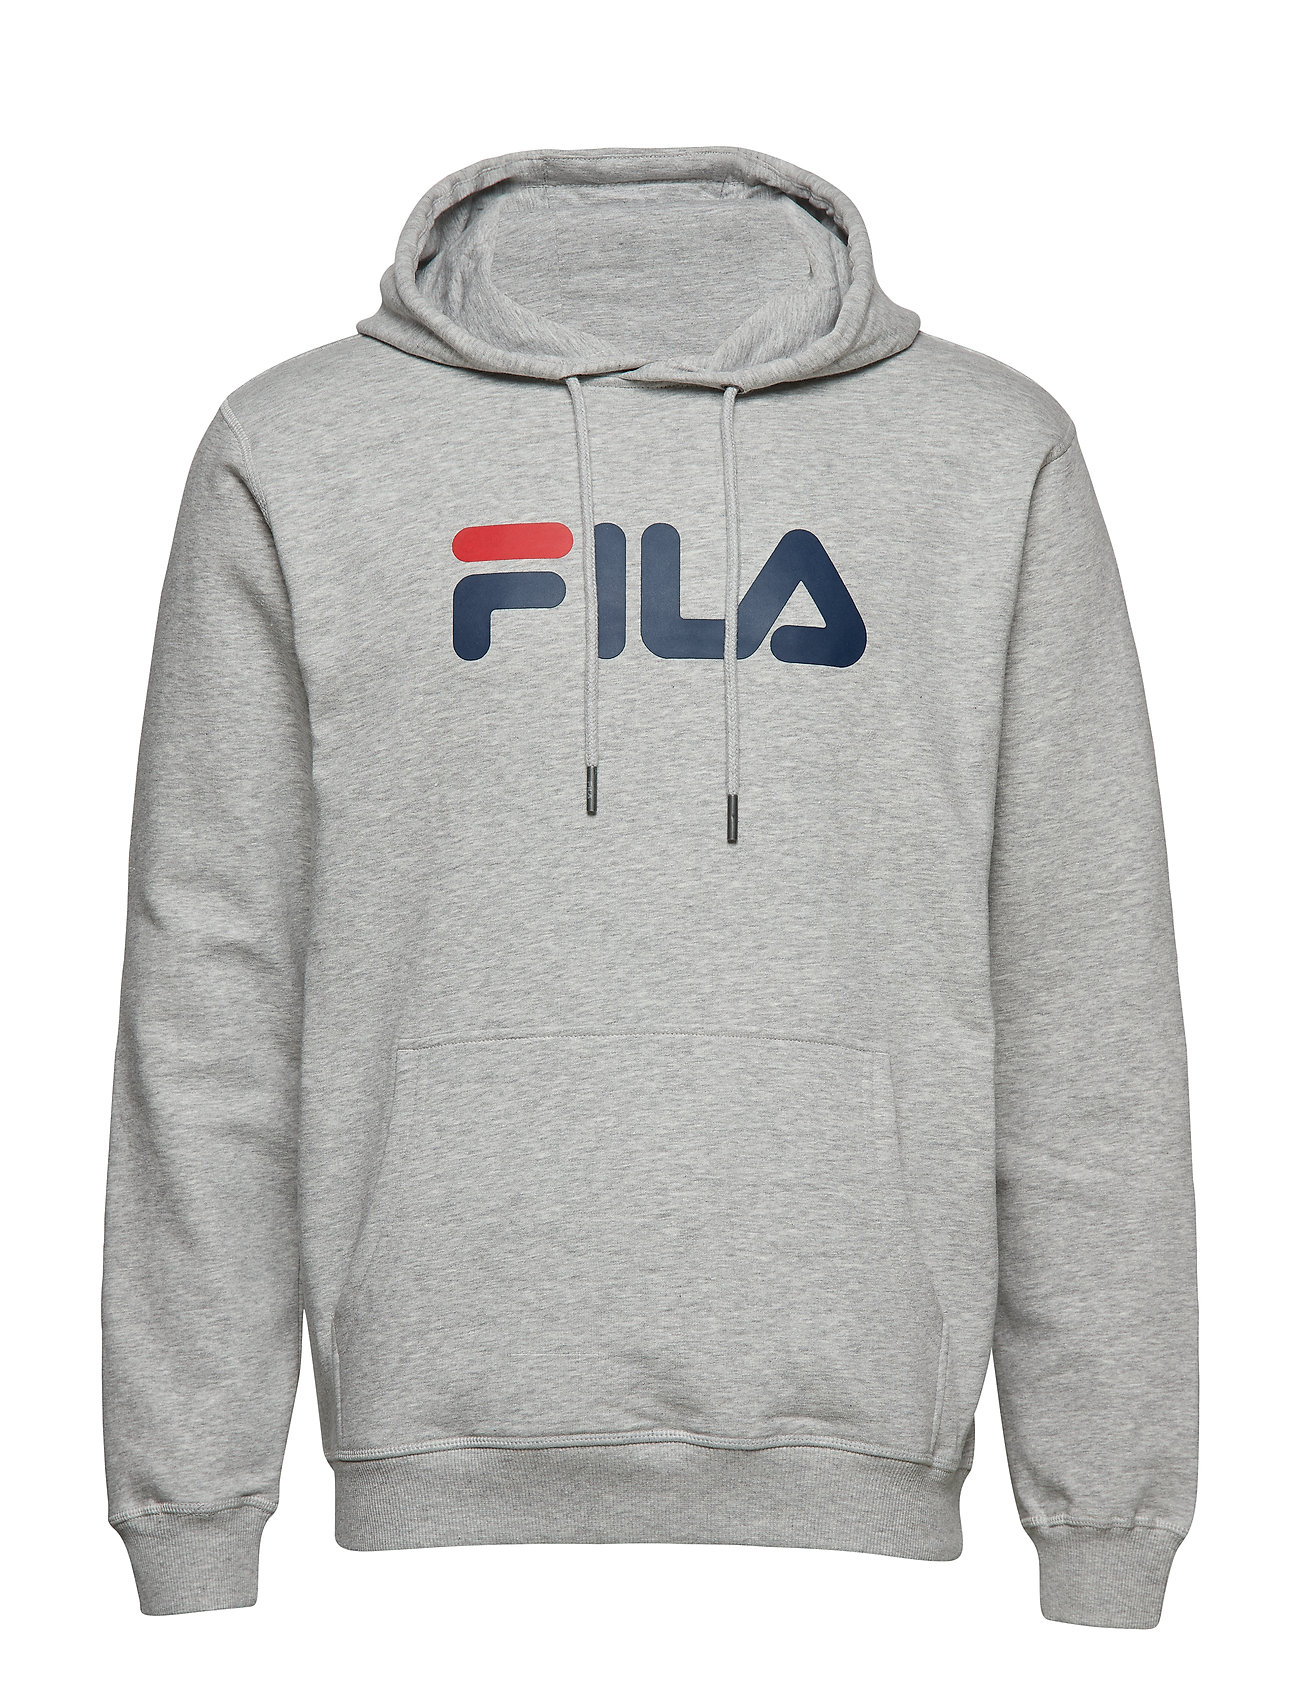 FILA UNISEX CLASSIC PURE hoody - LIGHT GREY MELANGE